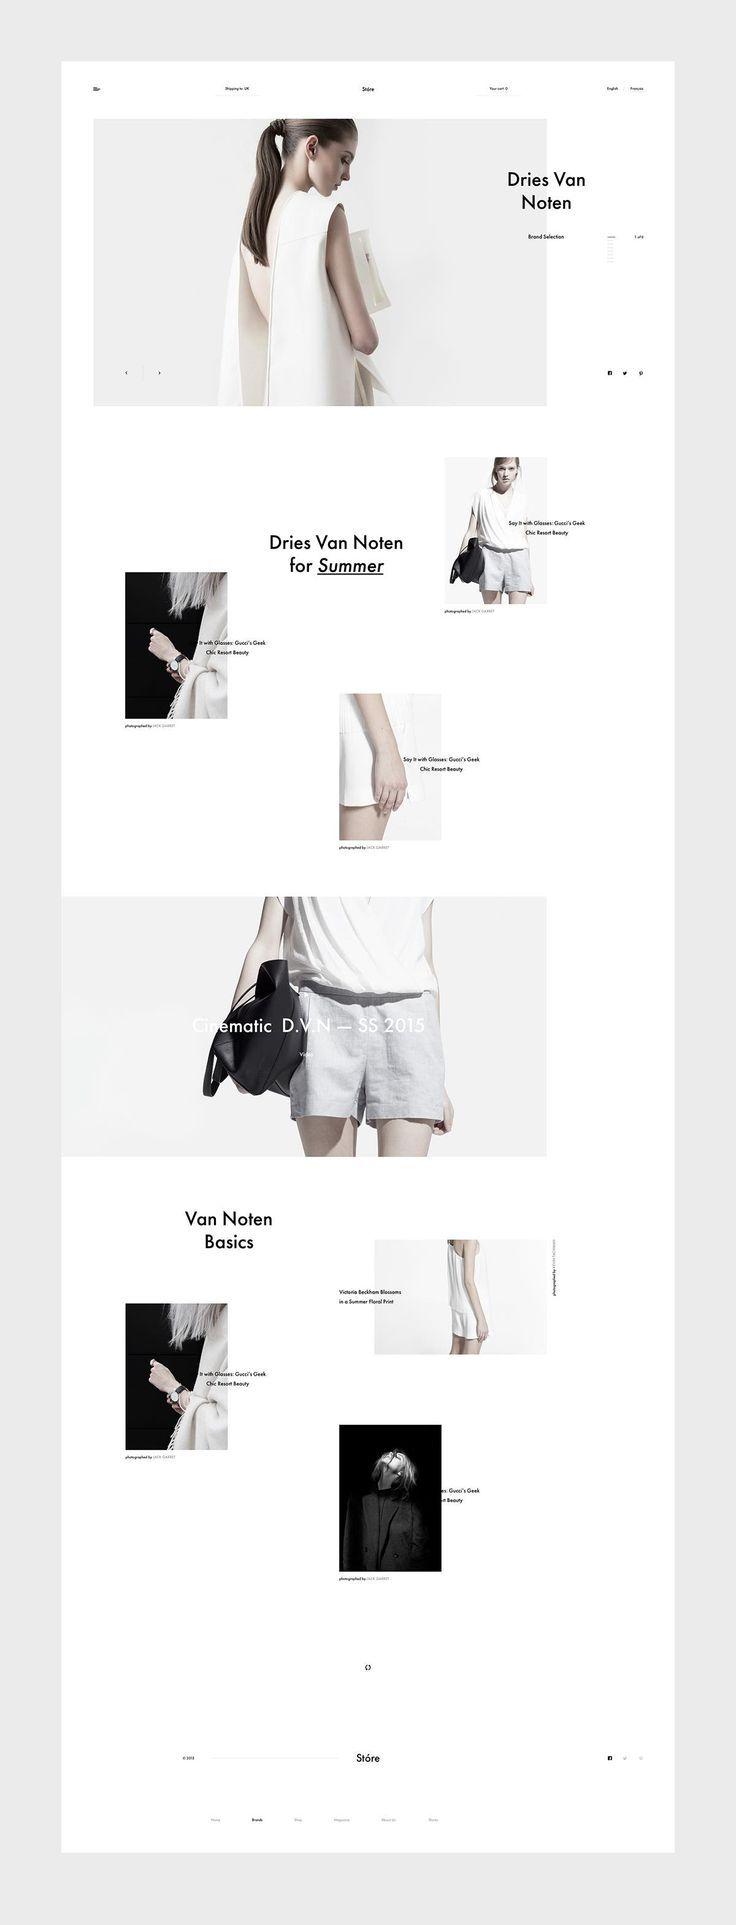 Design I Love, espace liberté respiration :)